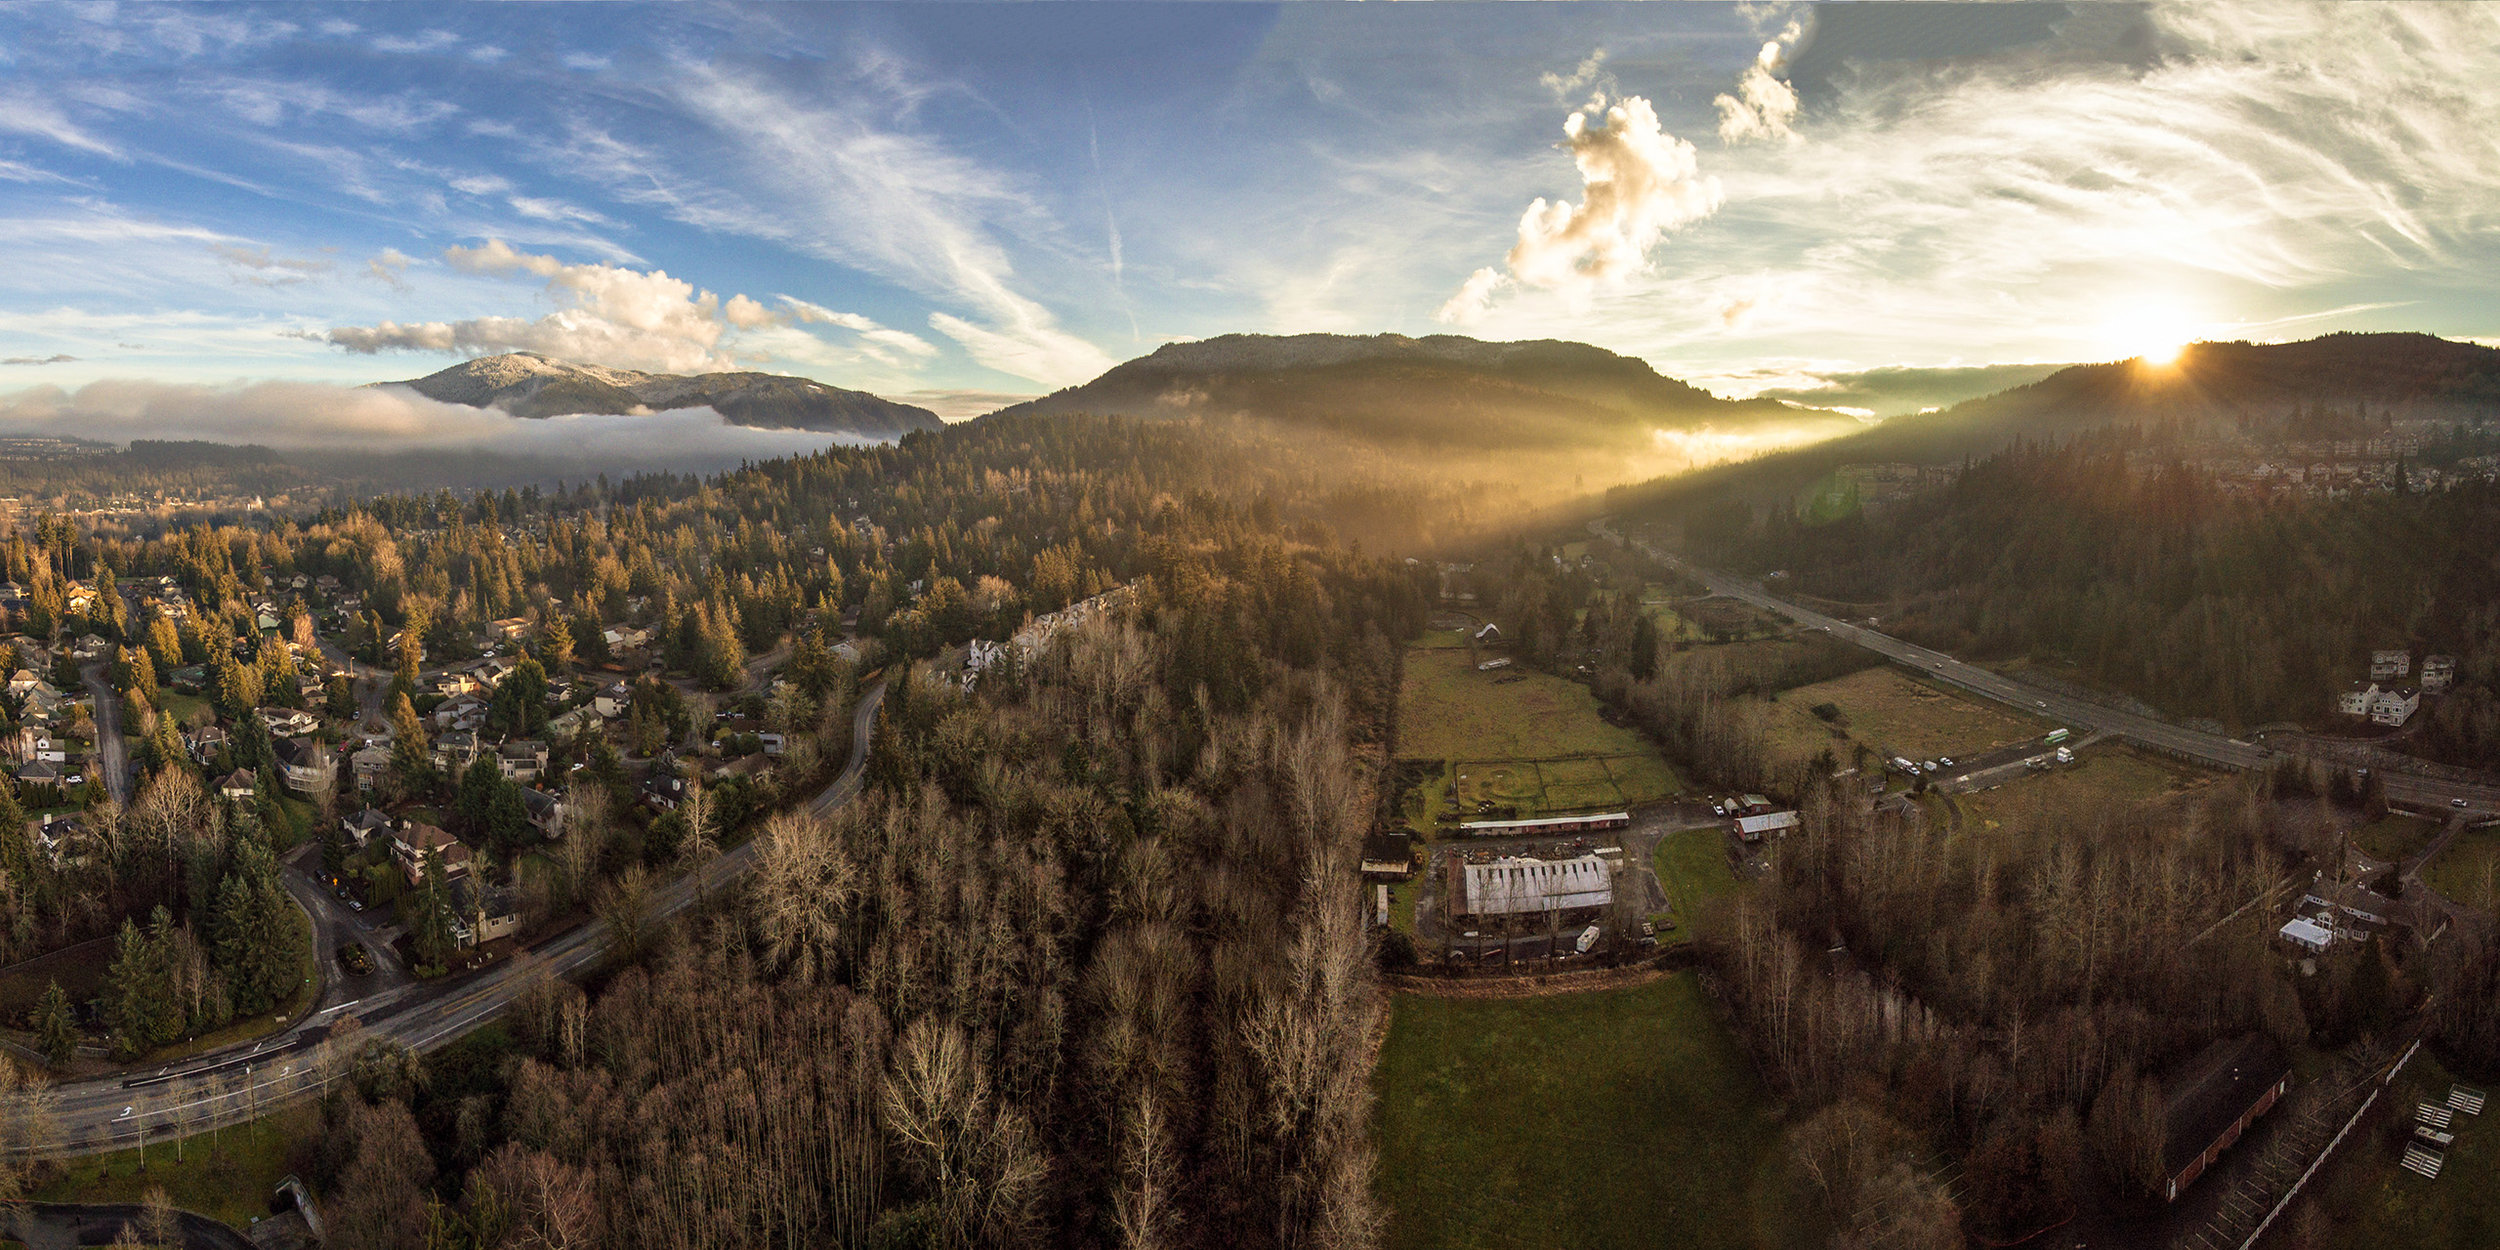 Eric_Krebs_Aerial_2017_Tibbets_Sunset_2560px.jpg